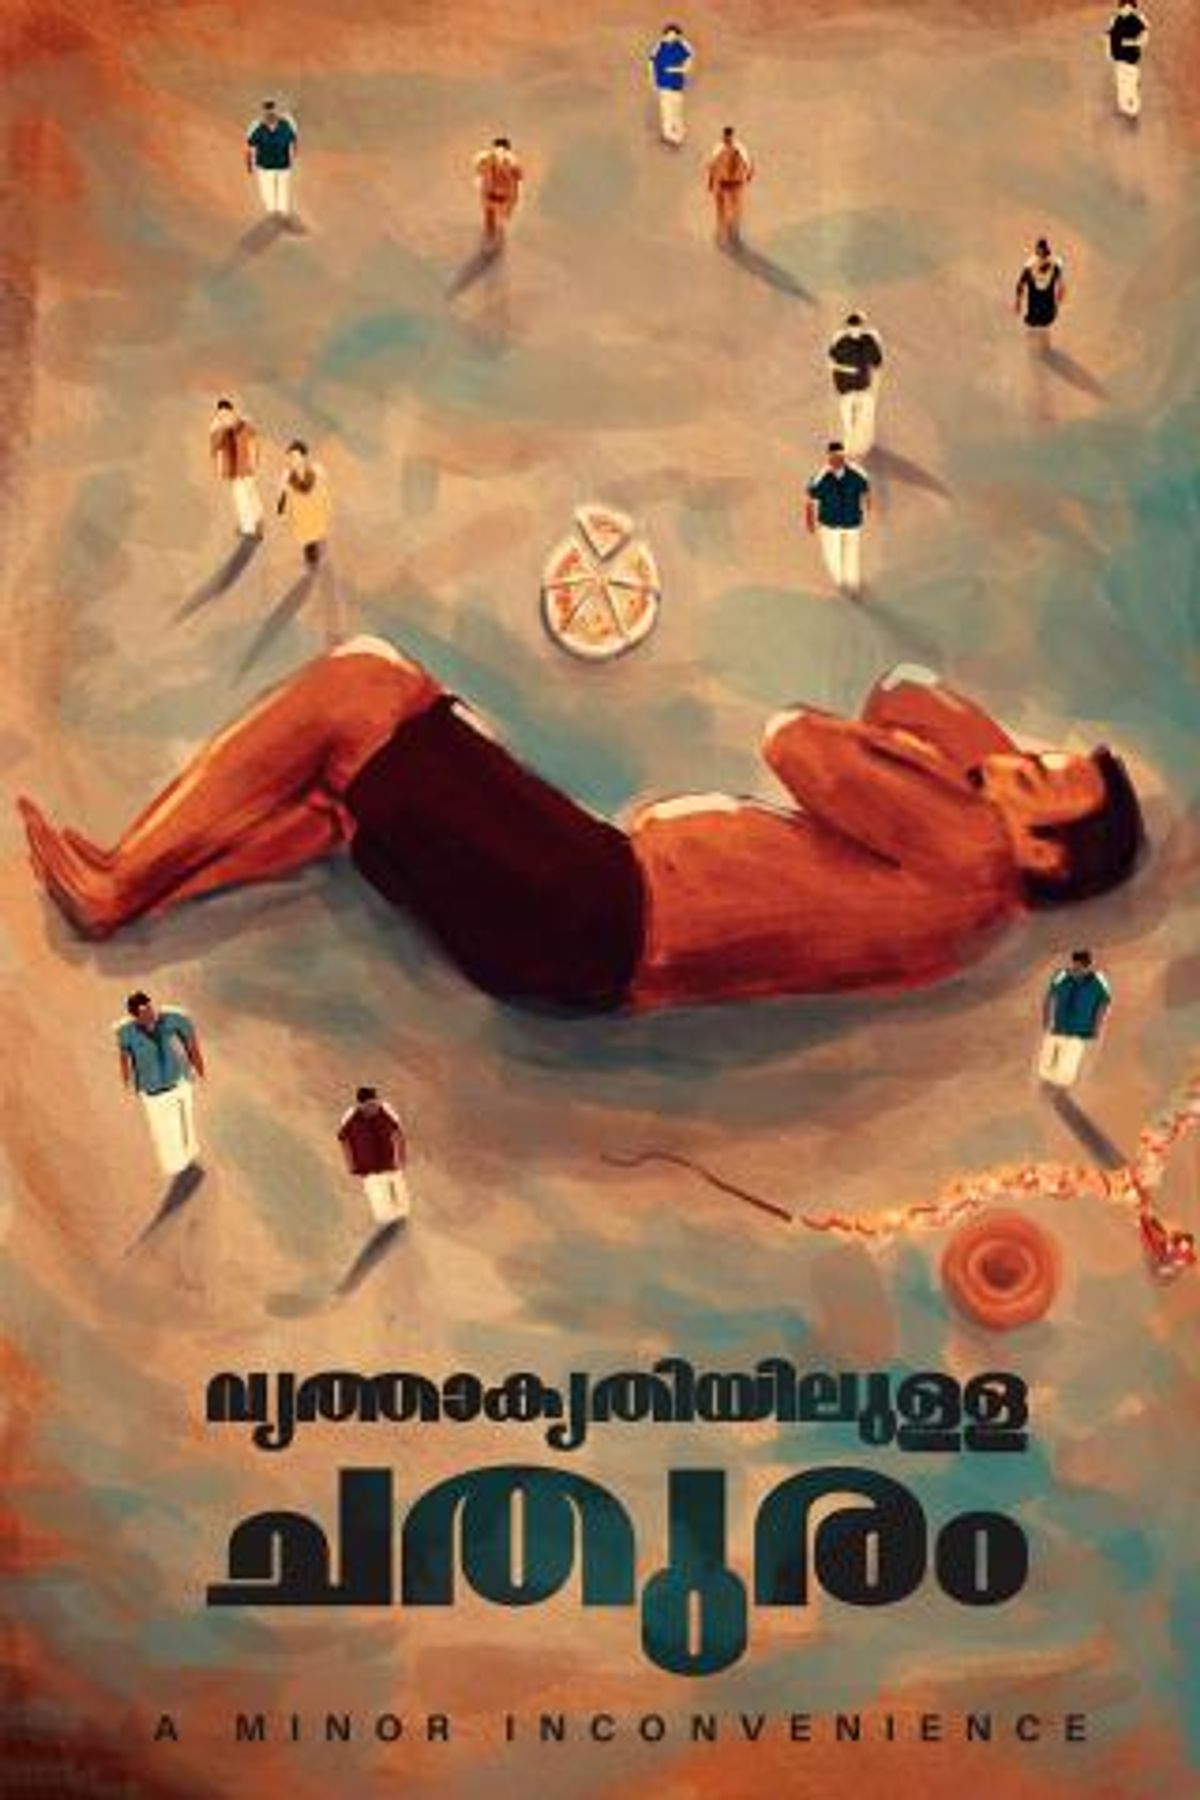 Vrithakrithyilulla Chathuram: A Minor Inconvenience